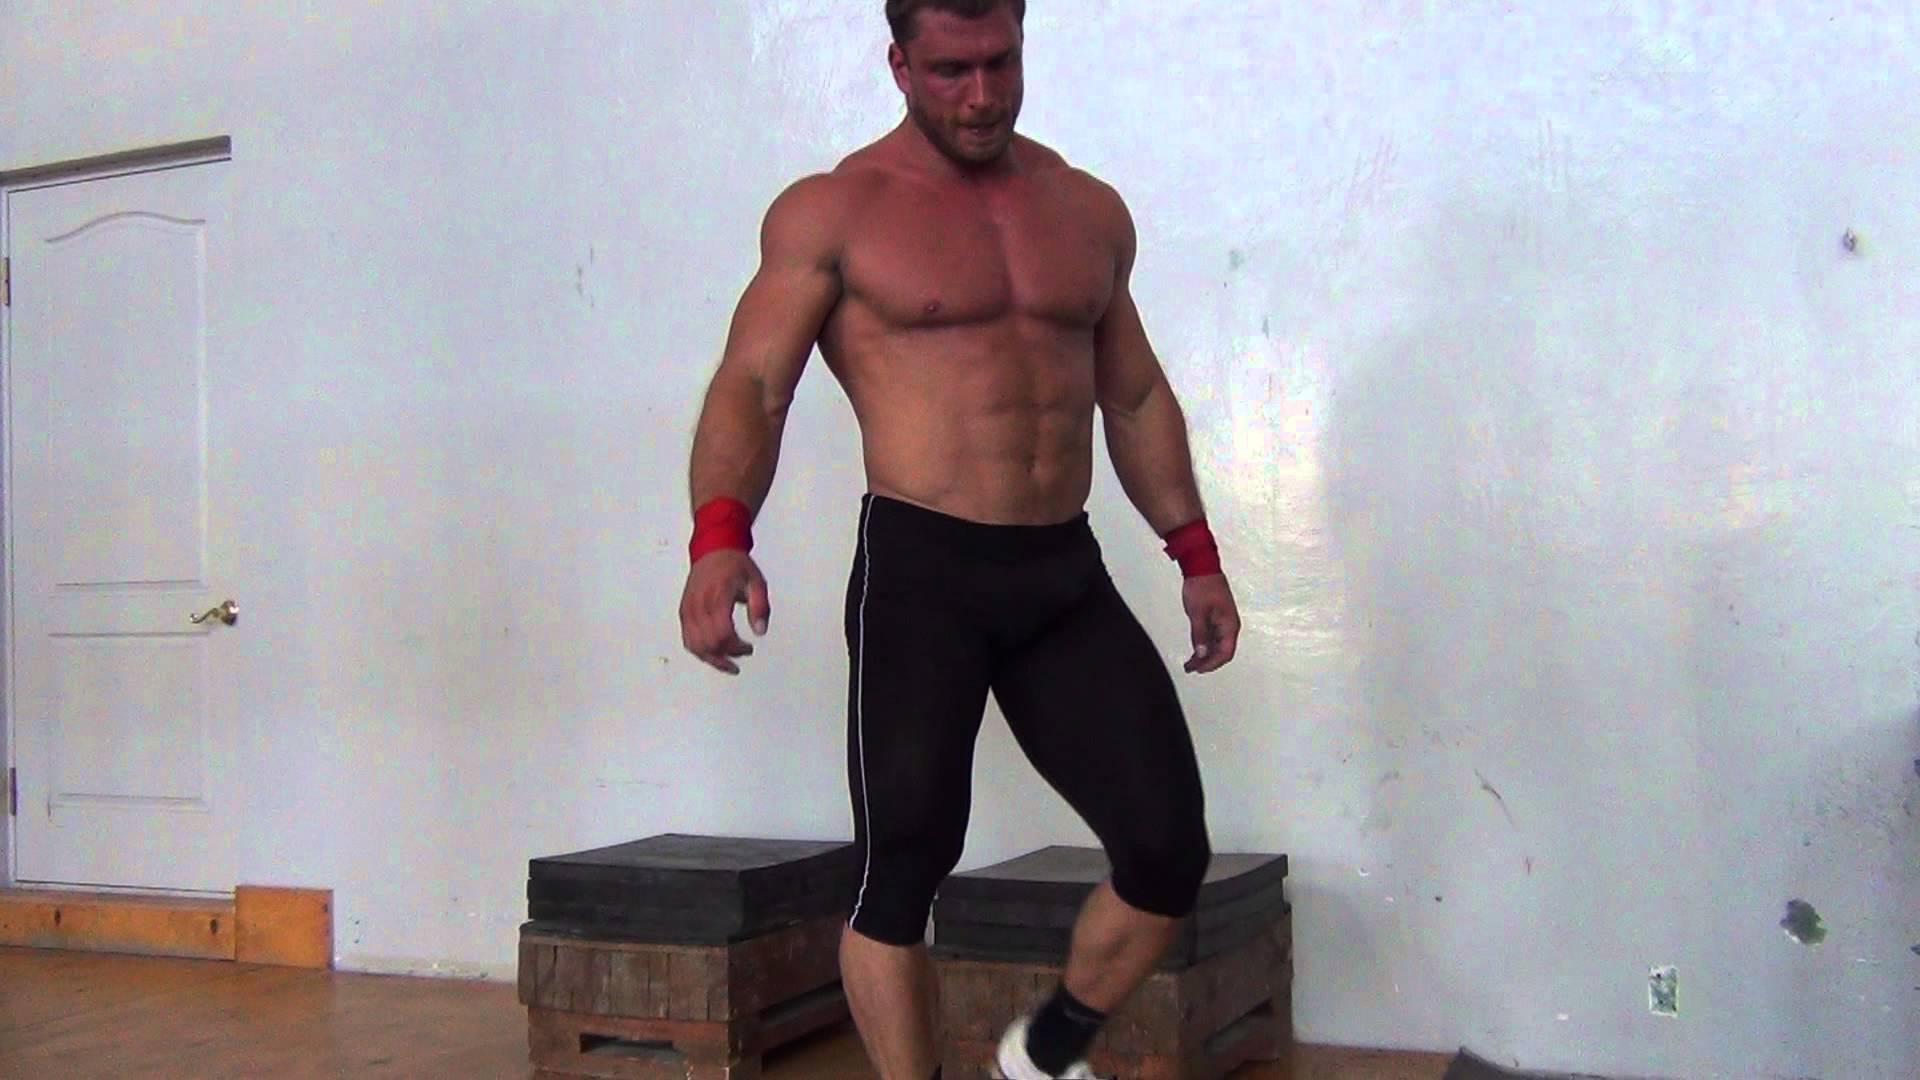 Dmitry Klokov Handstand Push Ups - All Things Gym